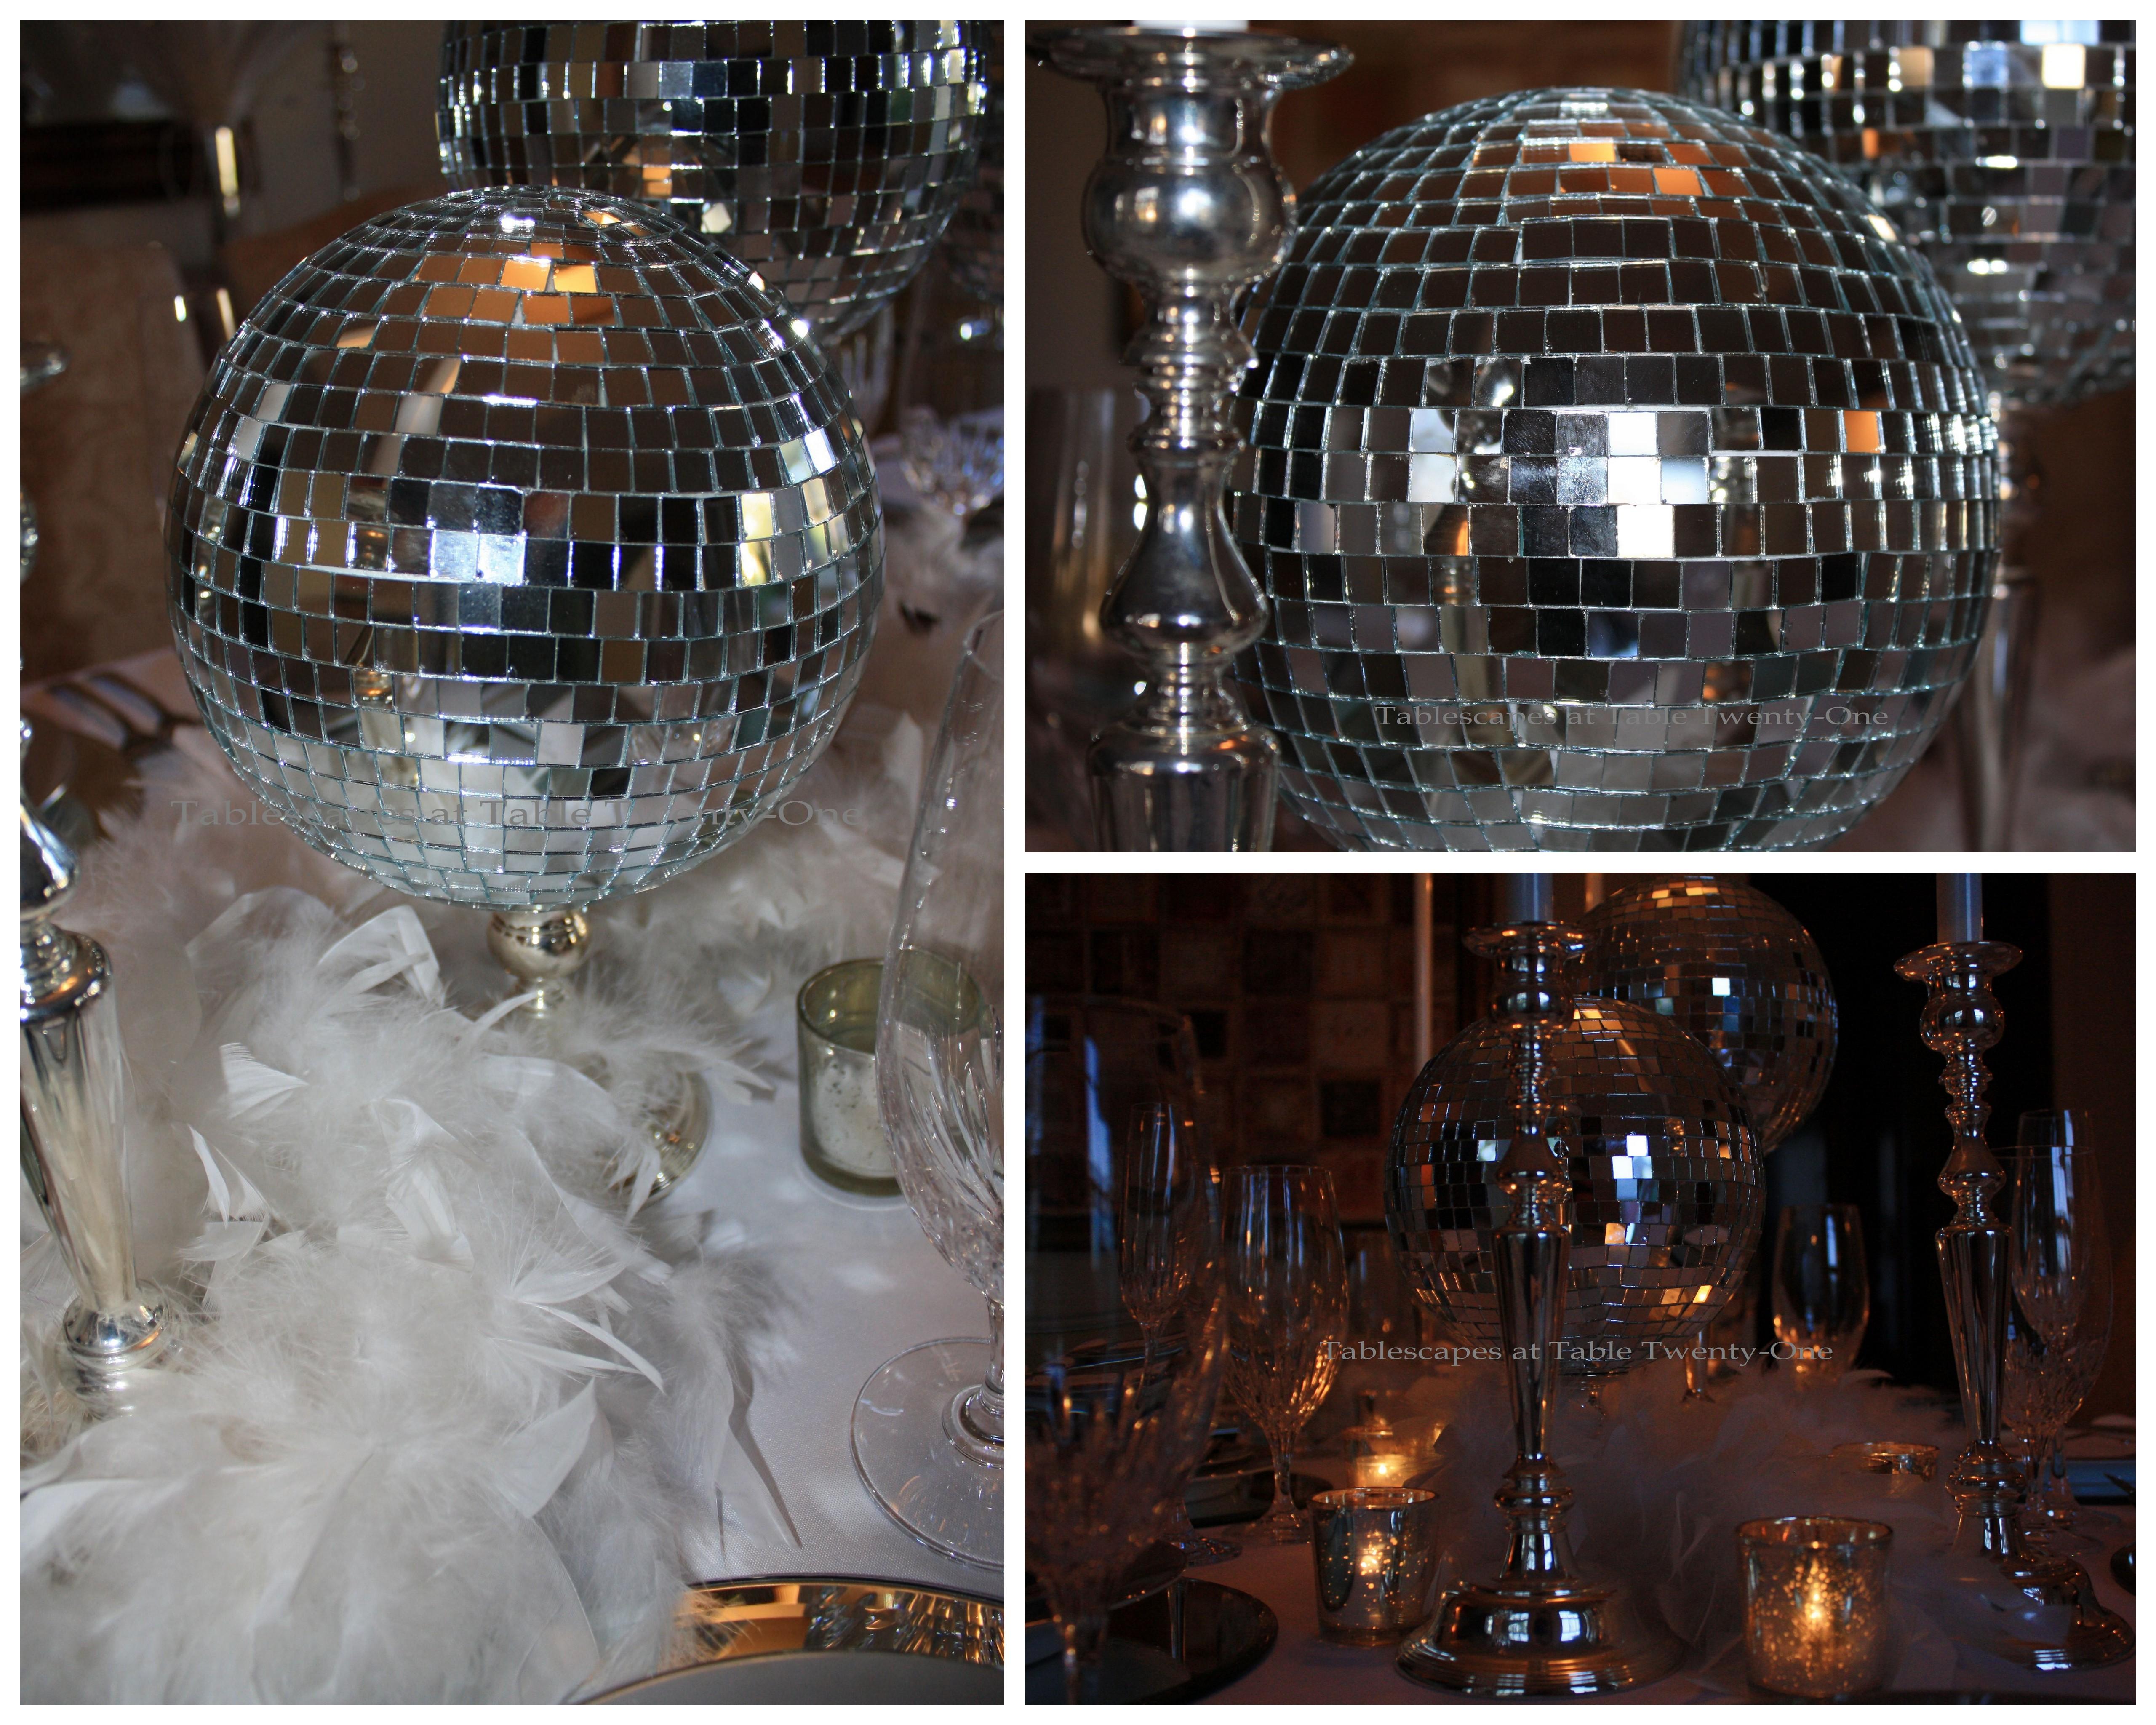 Mirror ball collage